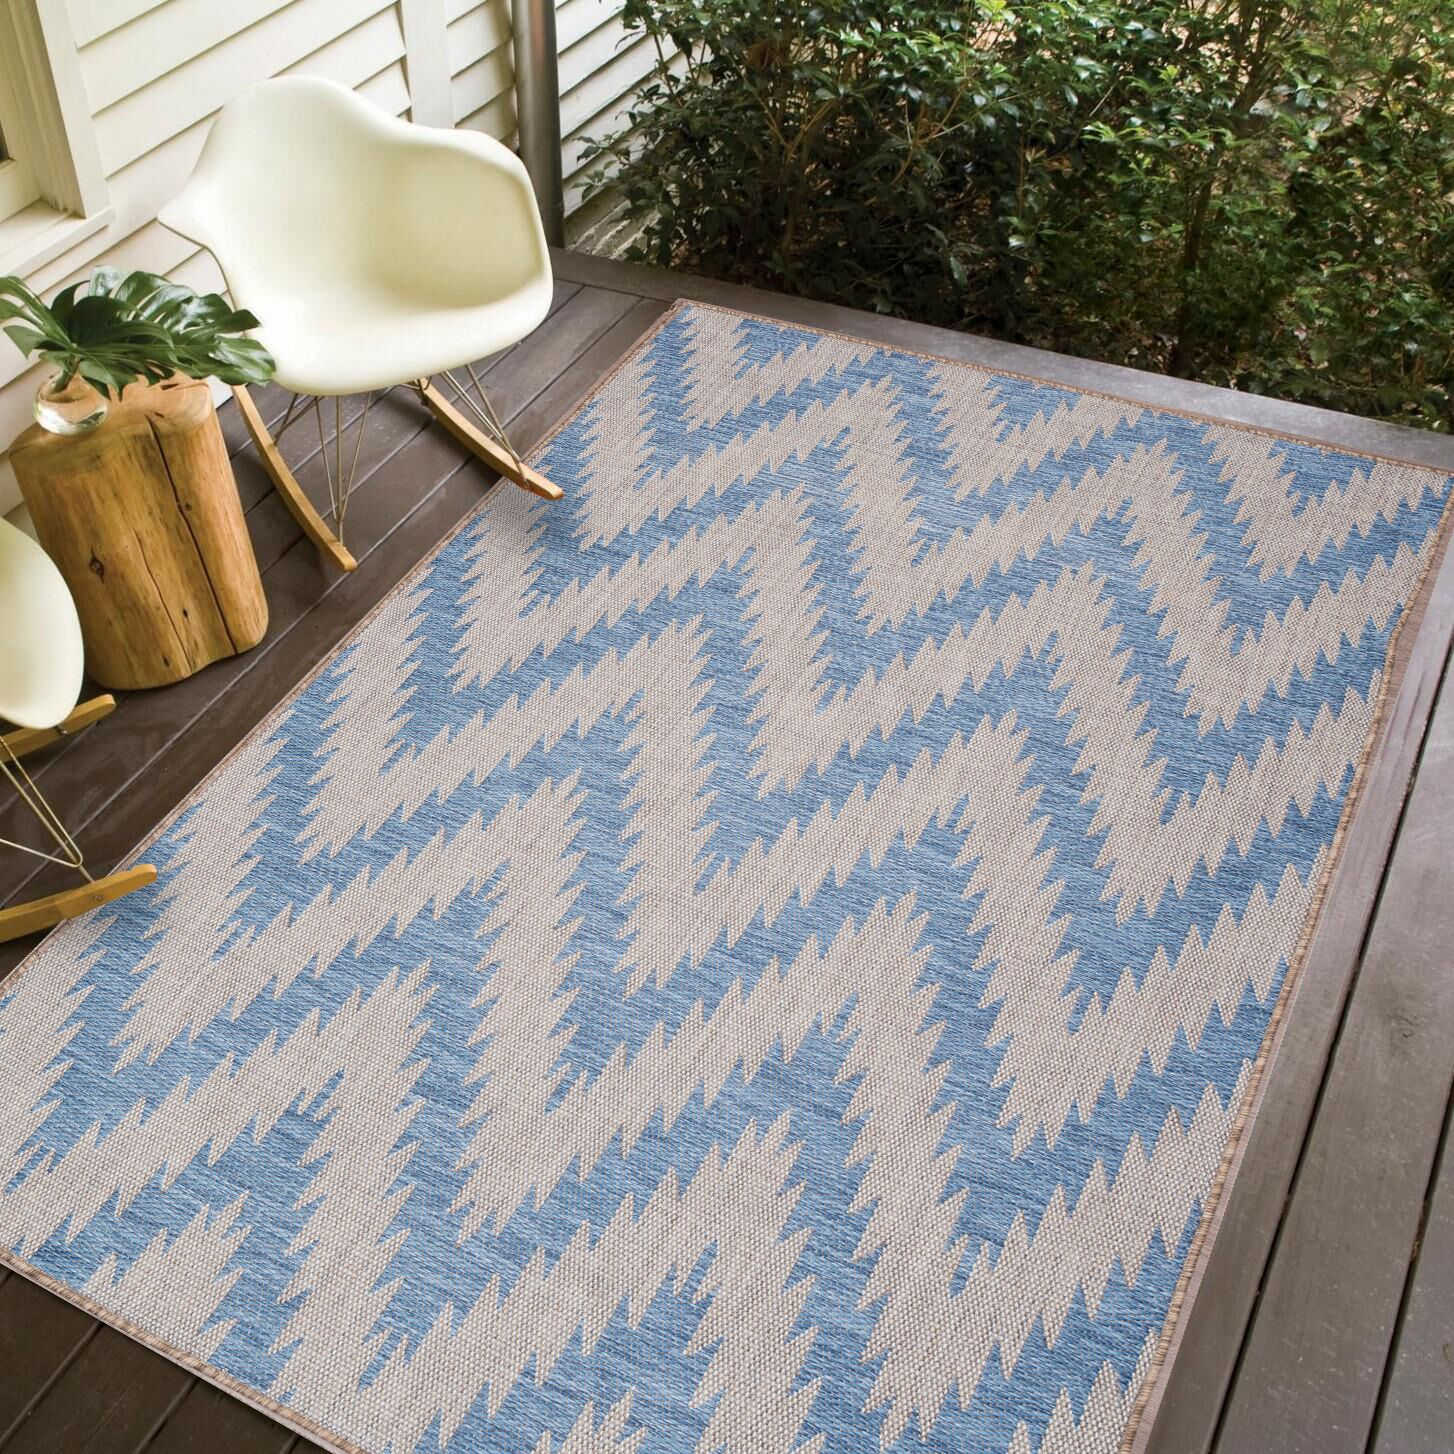 Stenberg Ivory/Blue Indoor/Outdoor Area Rug Rug Size: Rectangle 8'3 x 10'